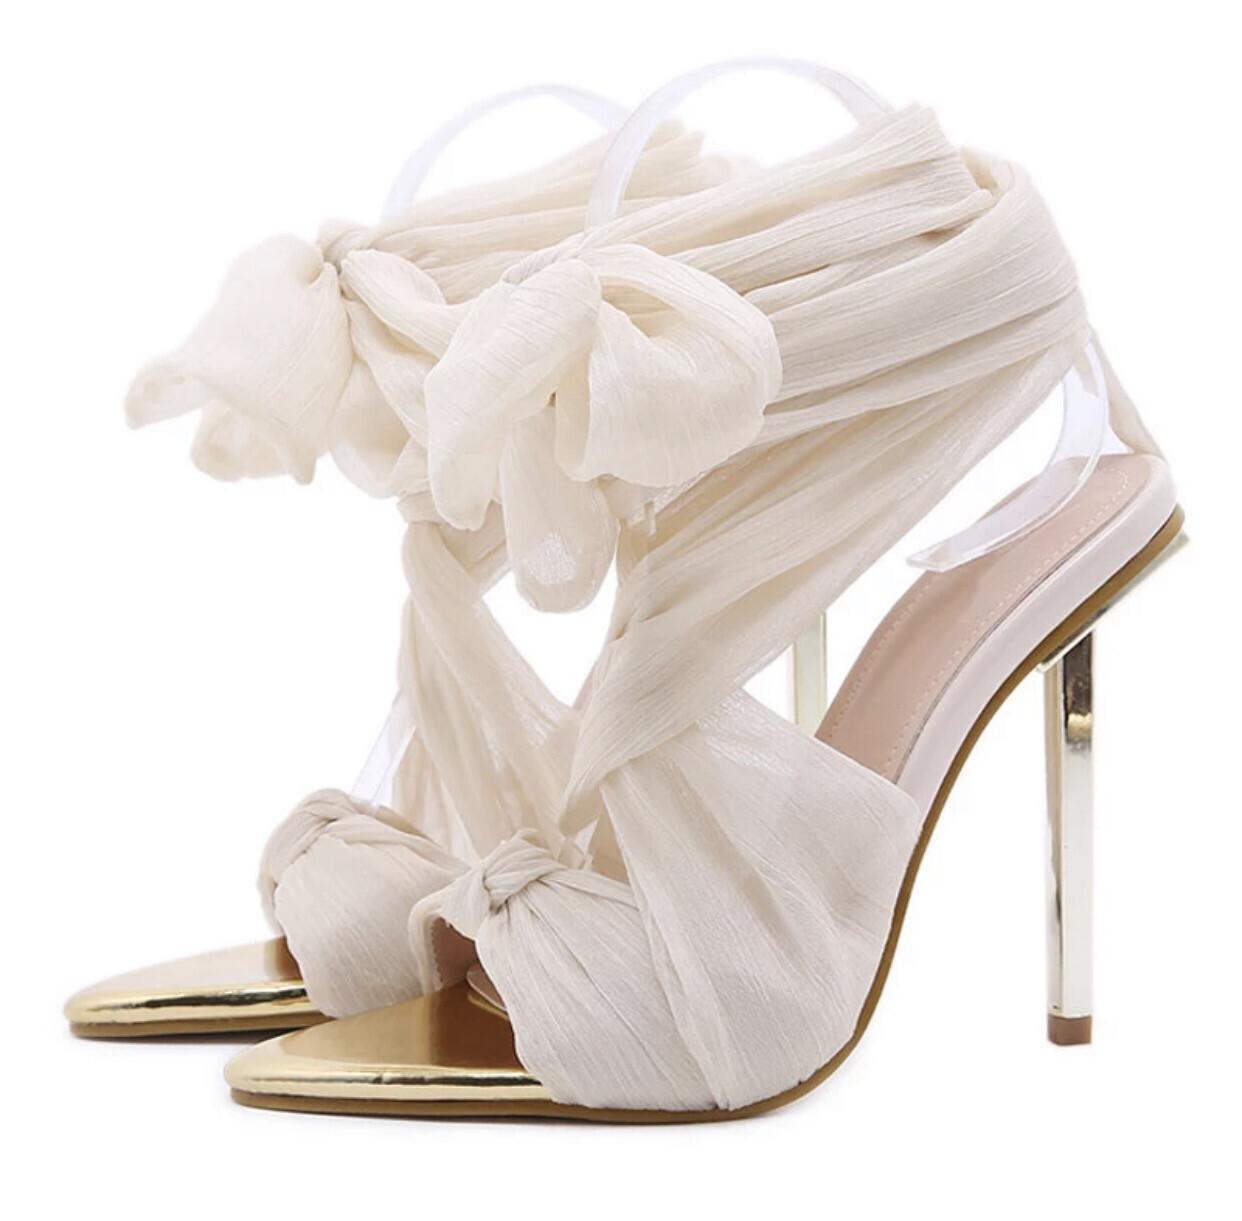 Chloe Chiffon Tie Up Heel